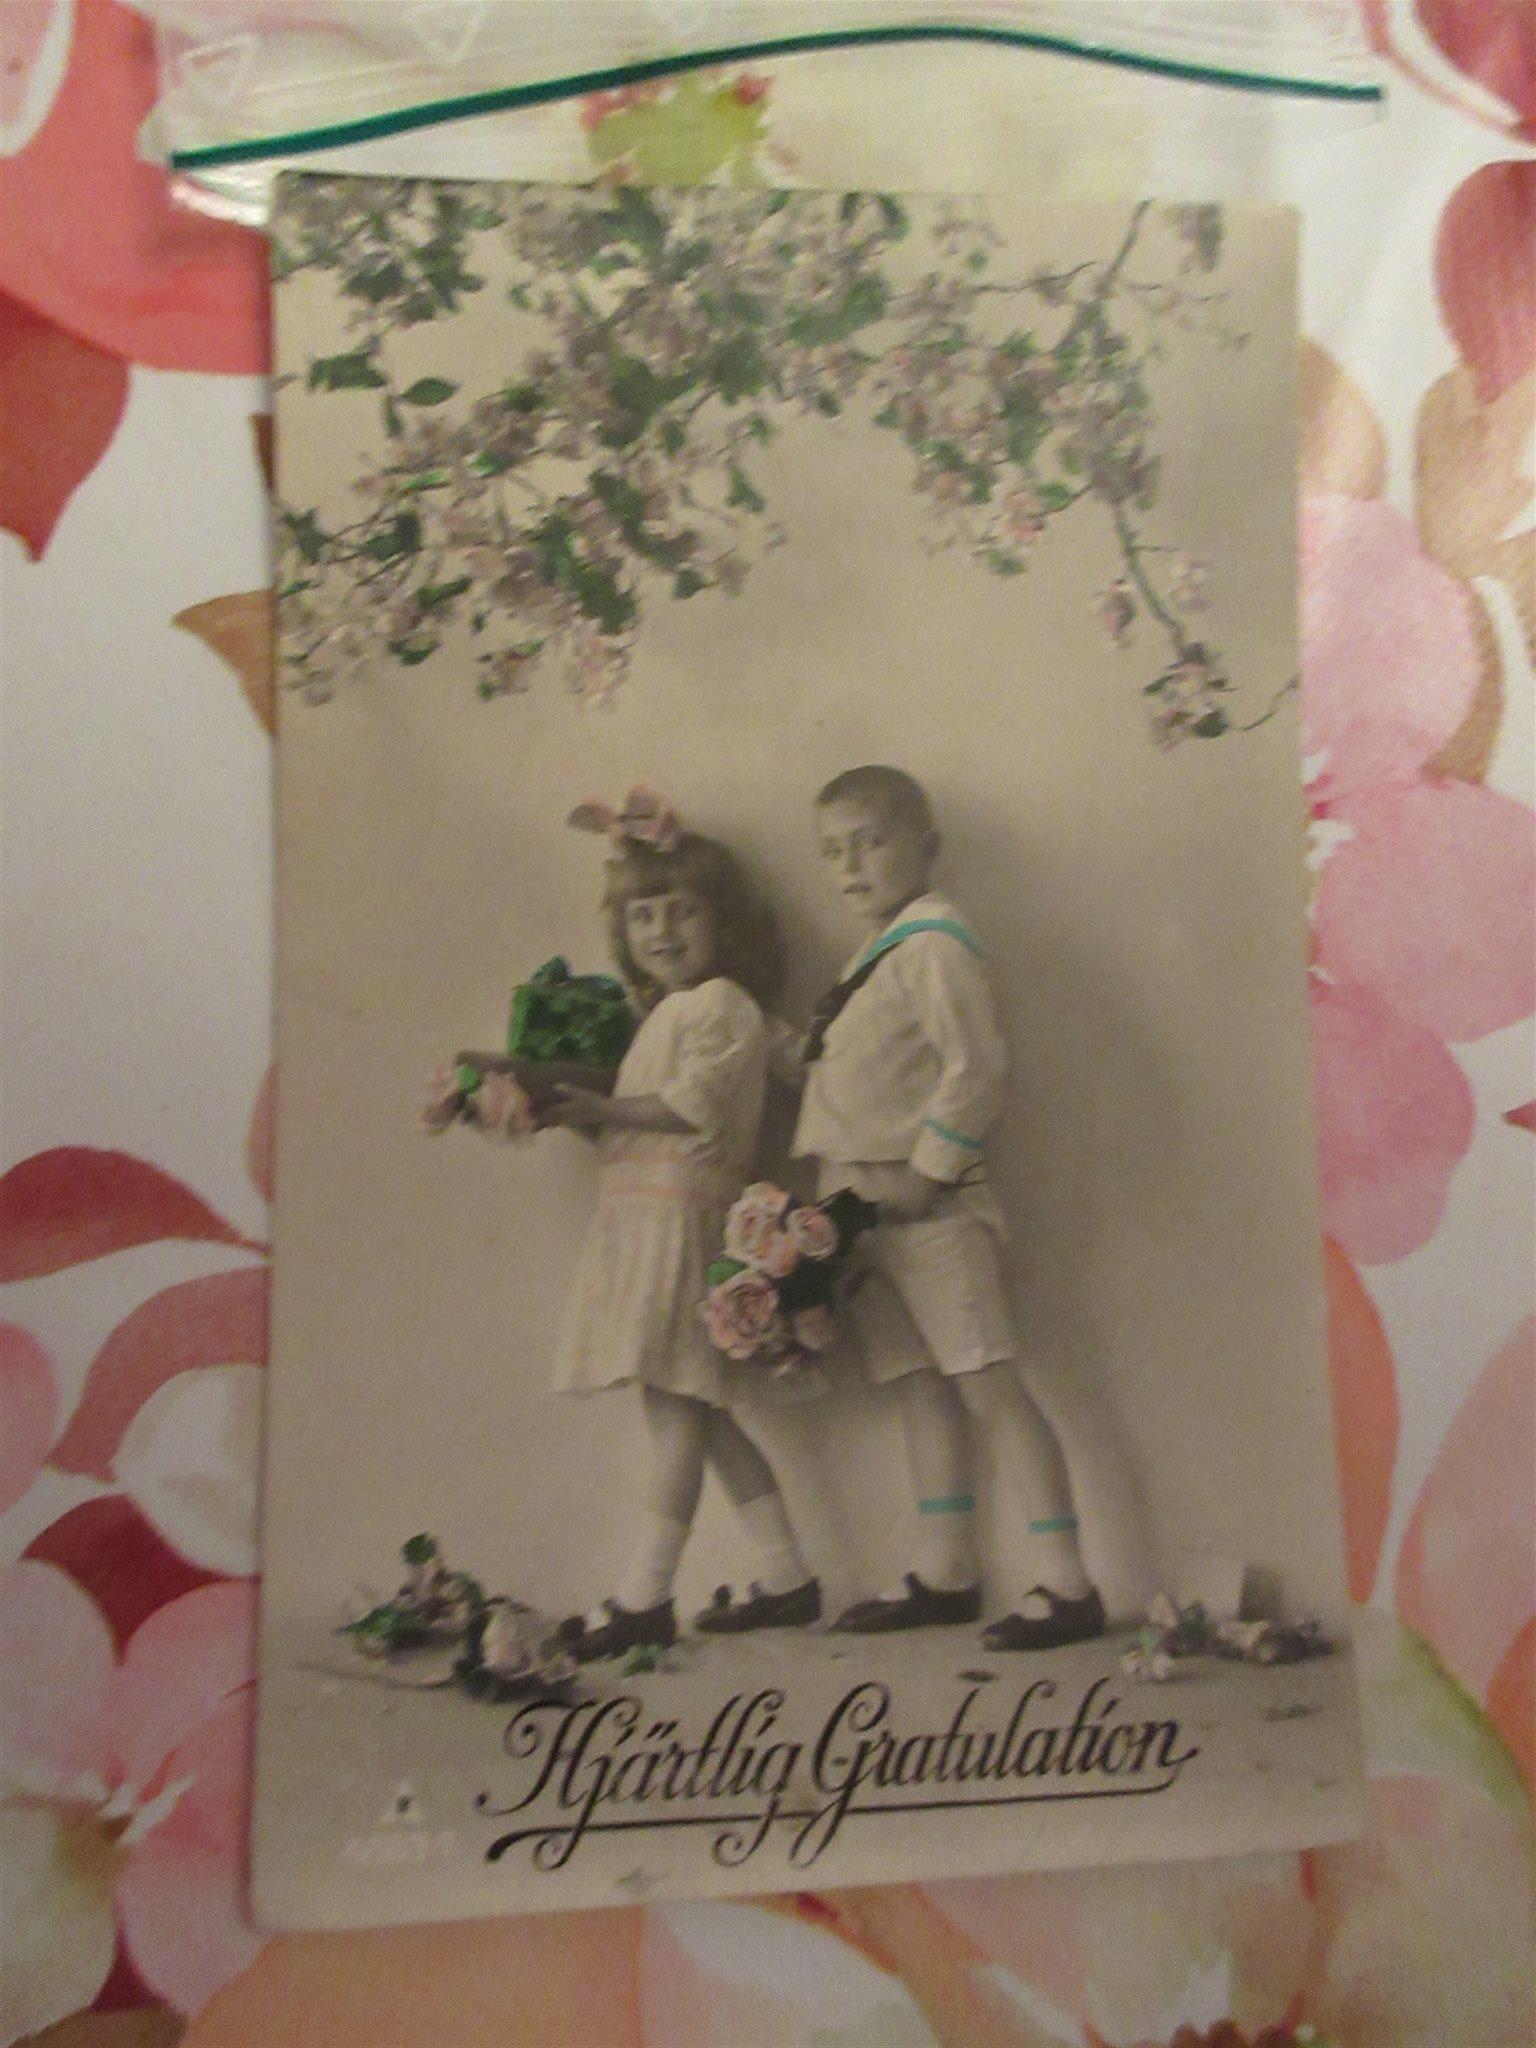 gamla gratulationskort 2 gamla gratulationskort (317155027) ᐈ Köp på Tradera gamla gratulationskort